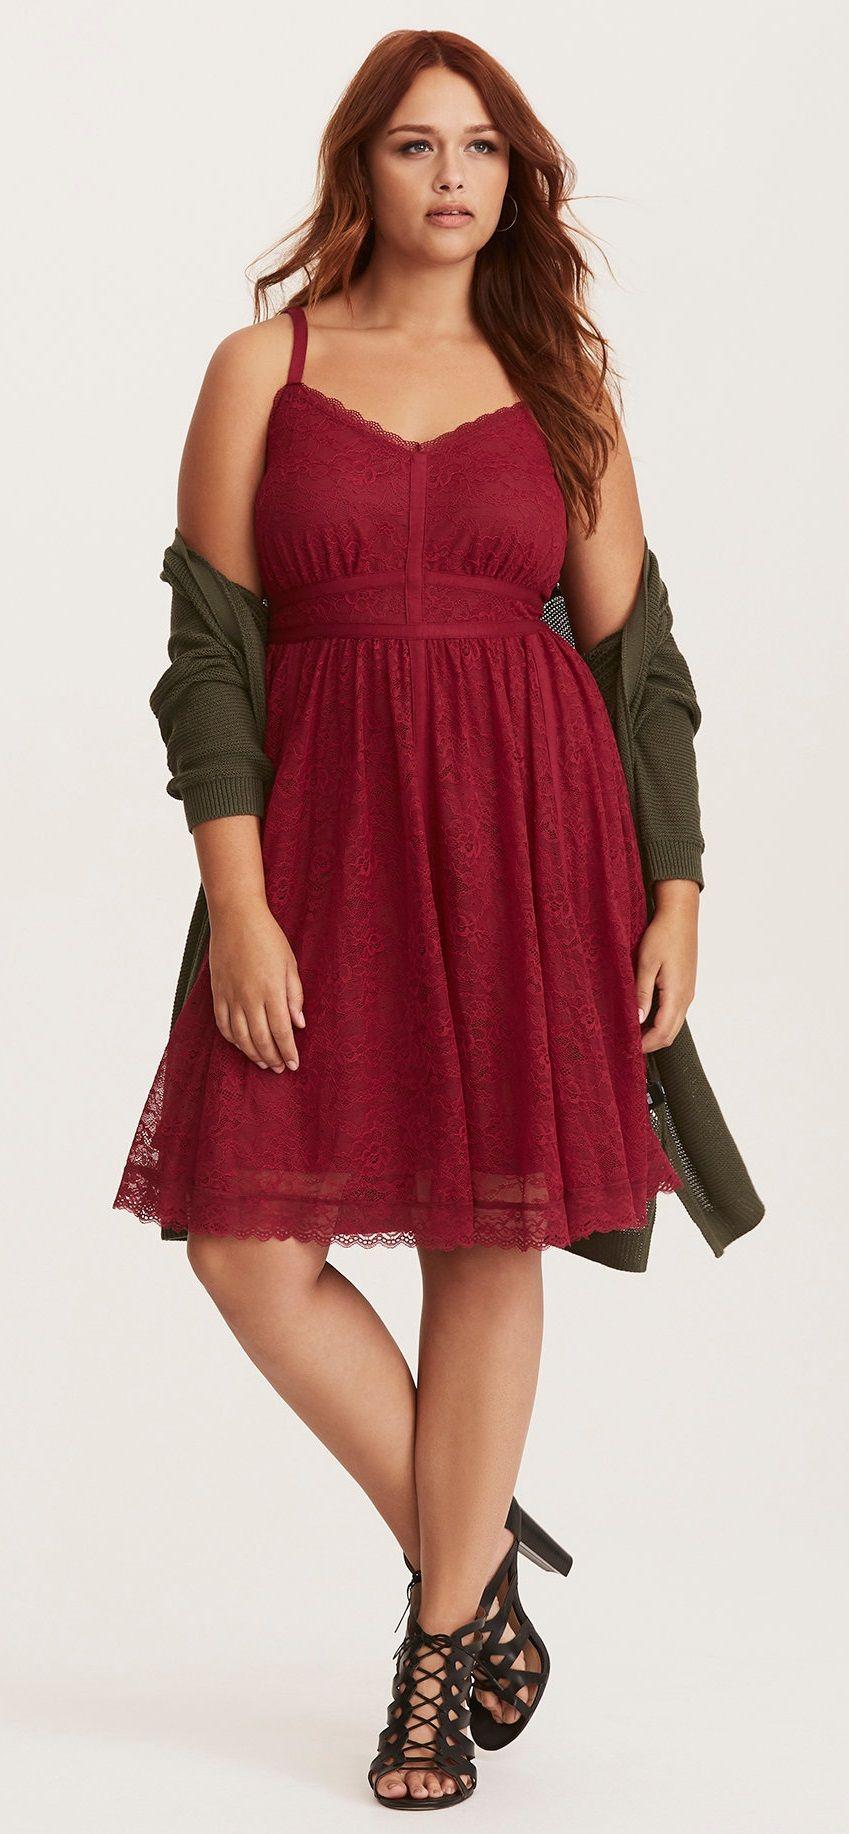 Plus Size Skater Dress   fashion   Pinterest   Dresses, Skater Dress ...